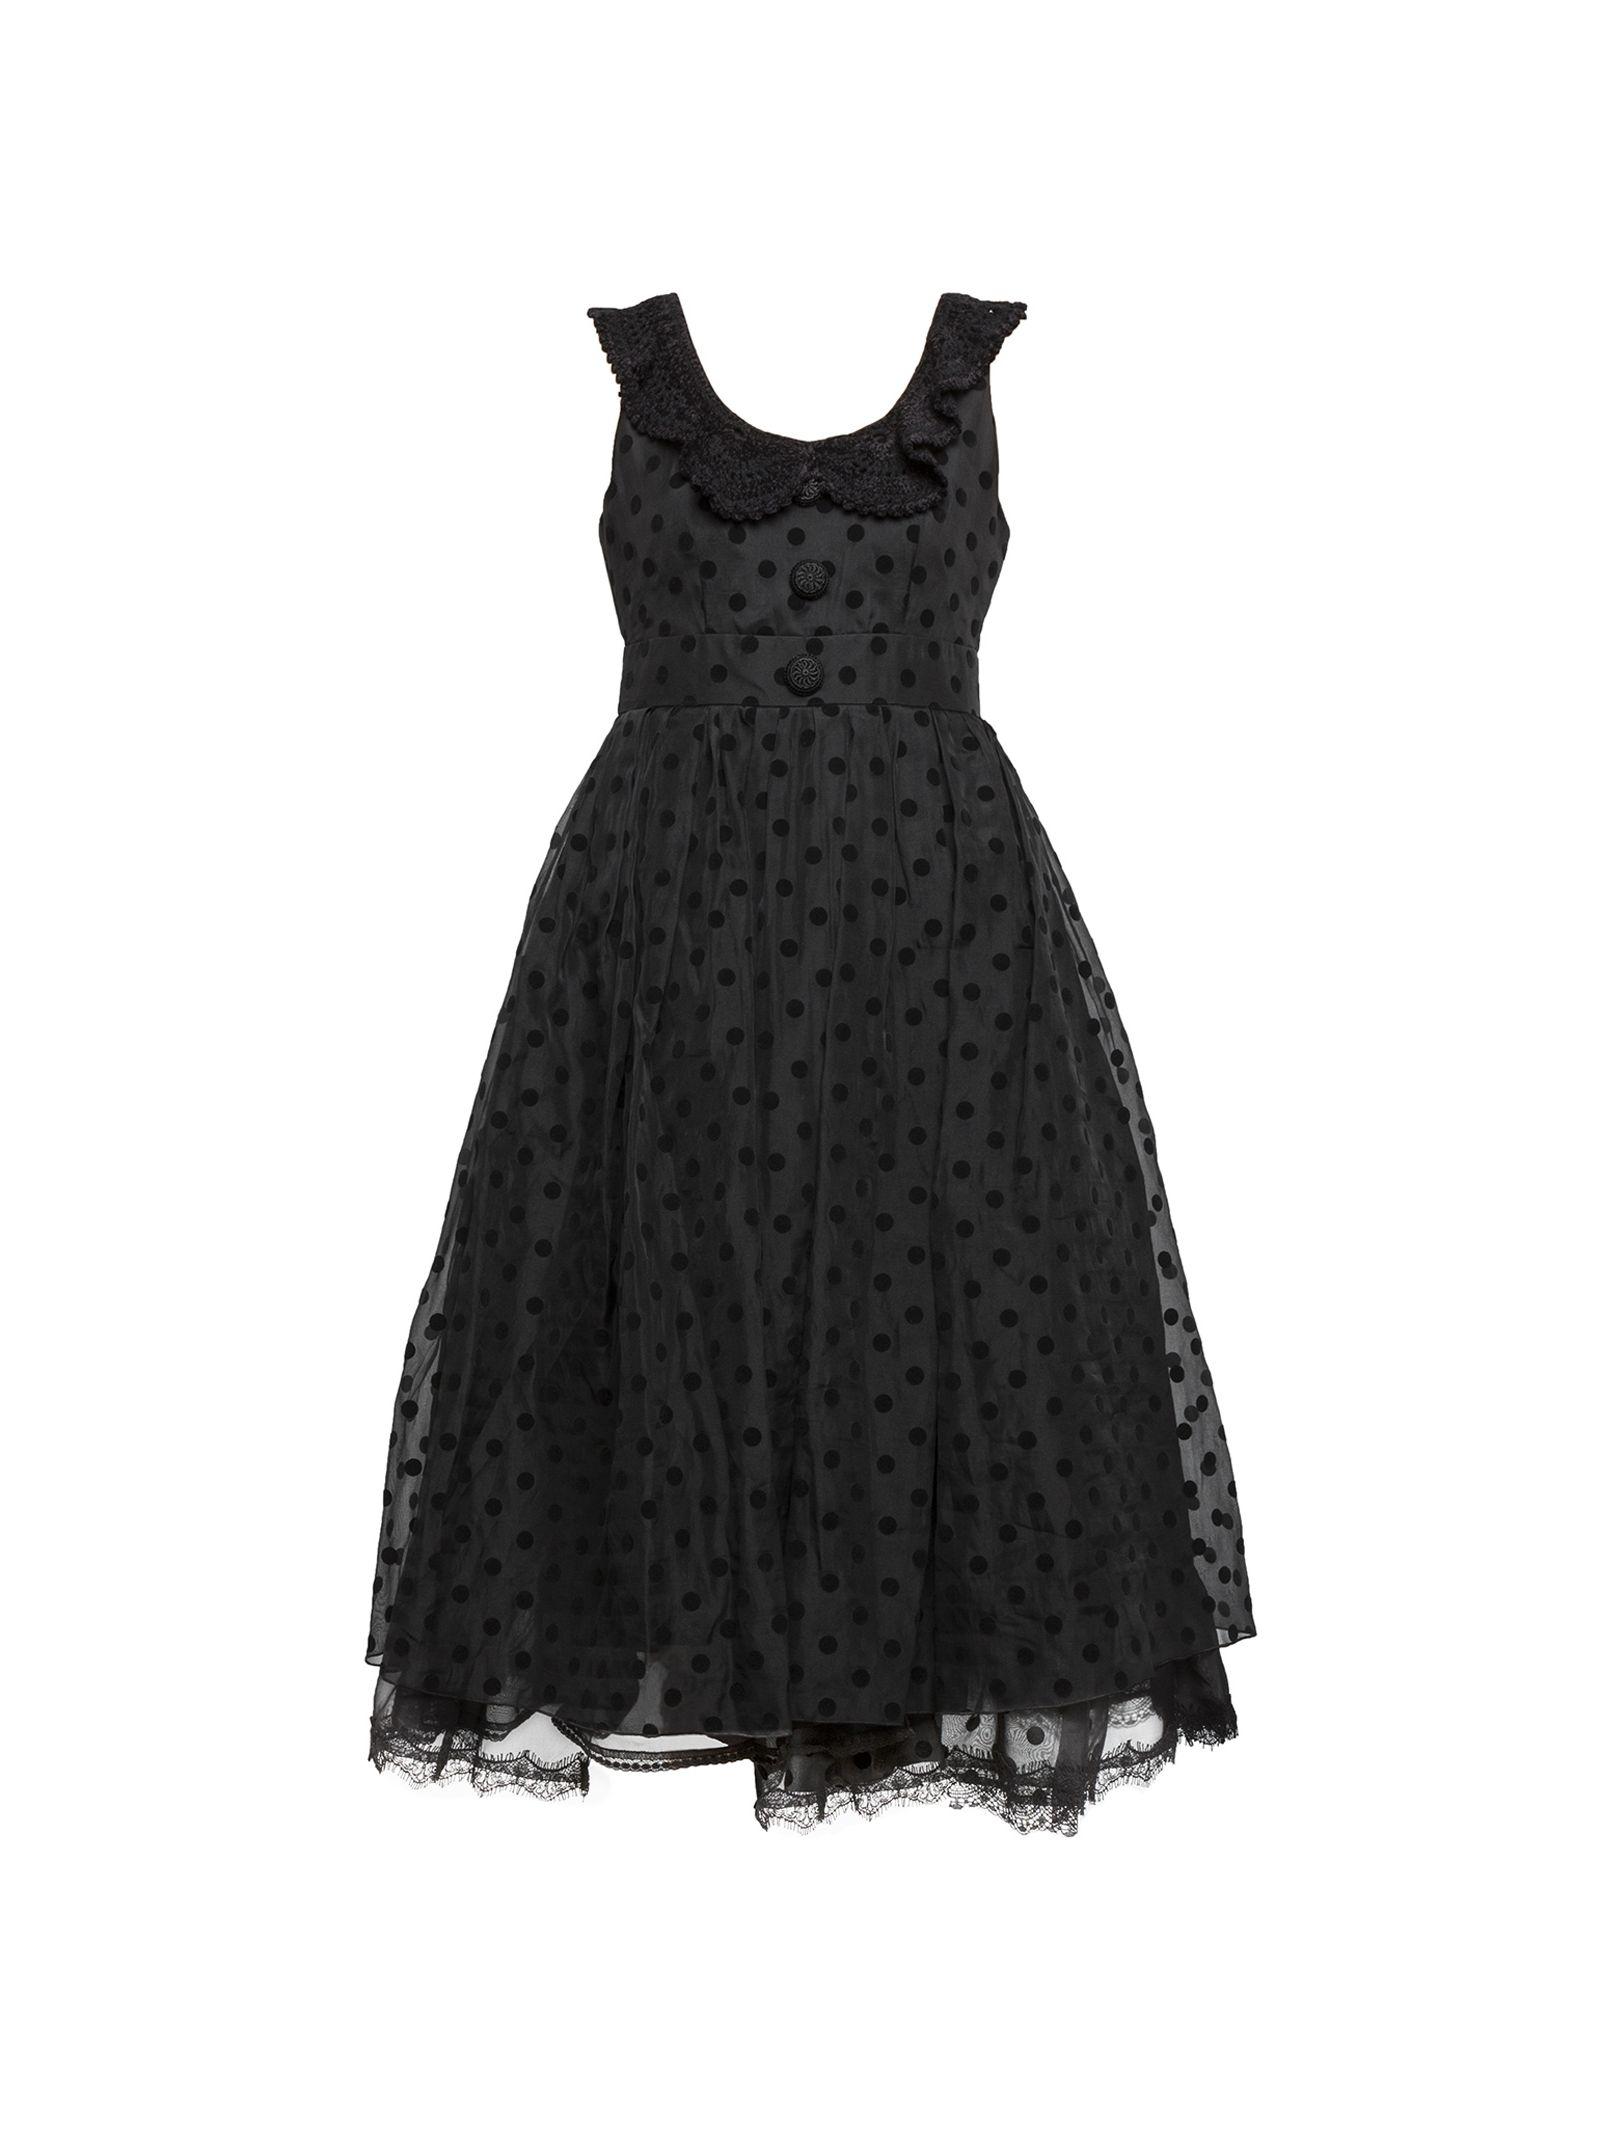 marc jacobs female marc jacobs black dress